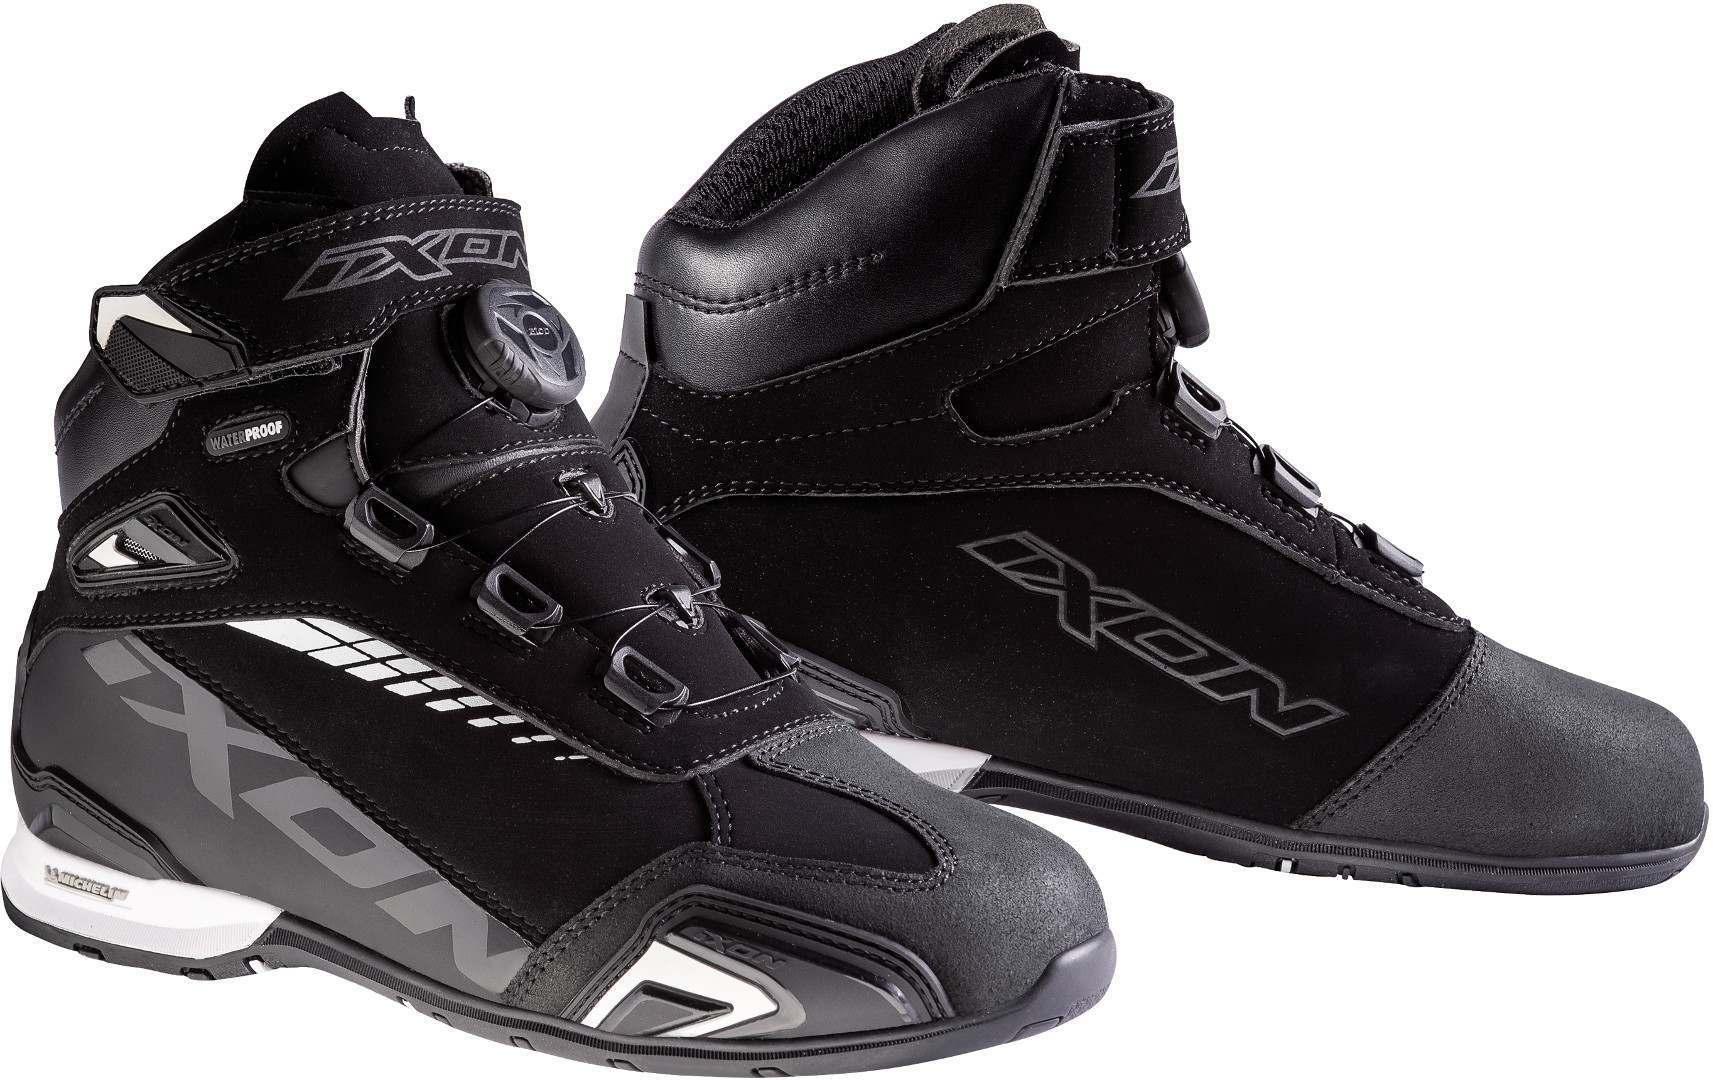 Ixon Bull WP L Damer motorcykel sko